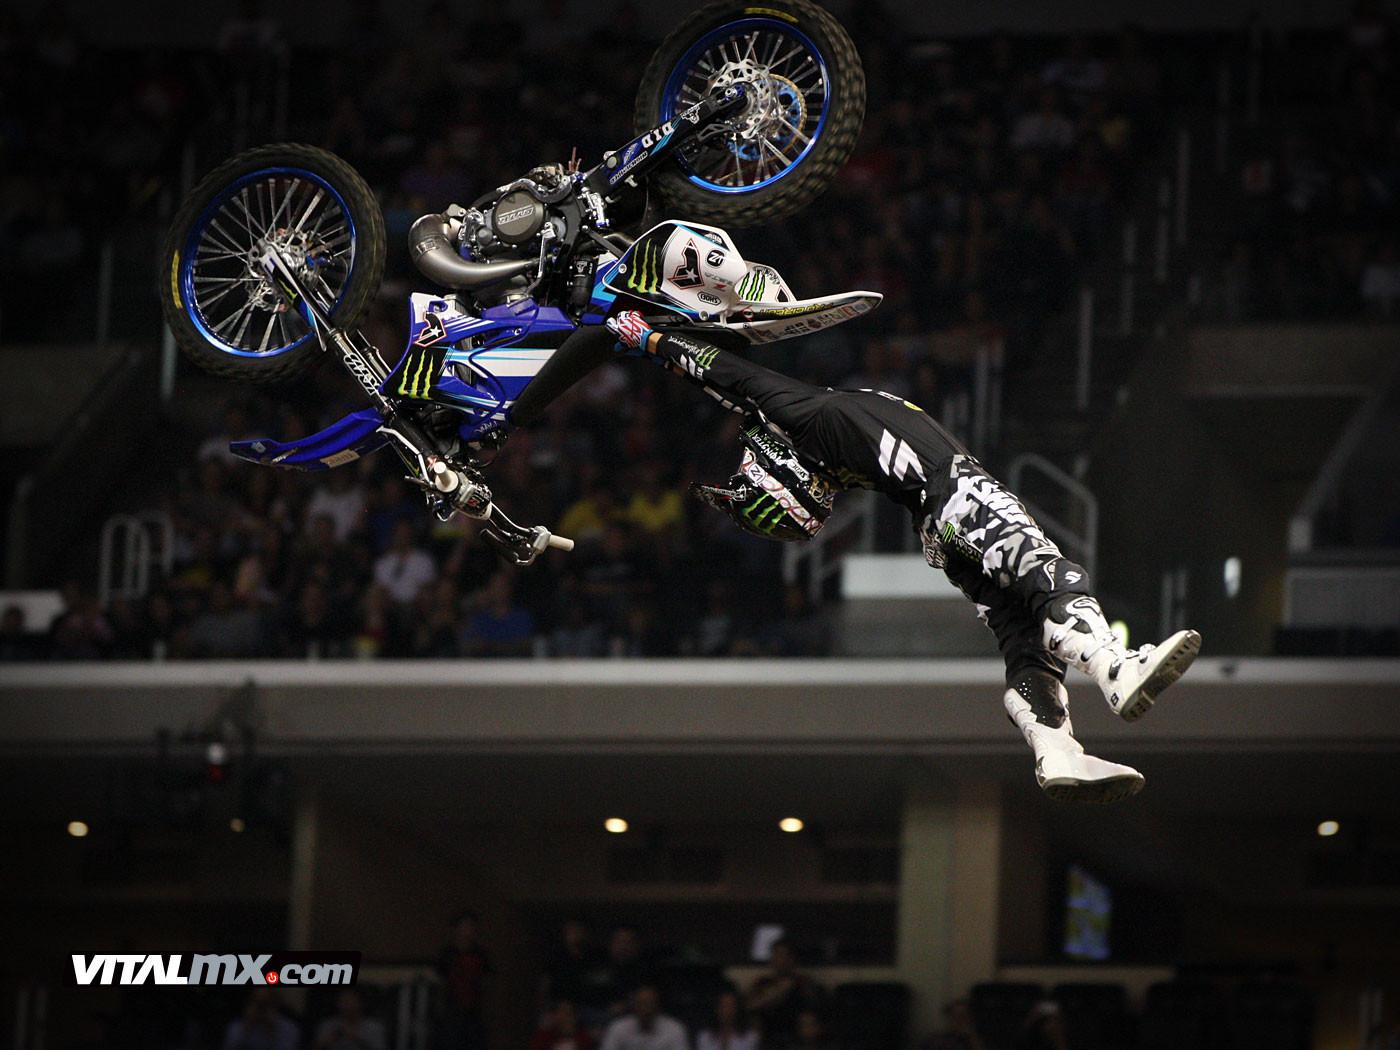 Taka Higashino - Pic o' The Day: Taka Higashino  - Motocross Pictures - Vital MX